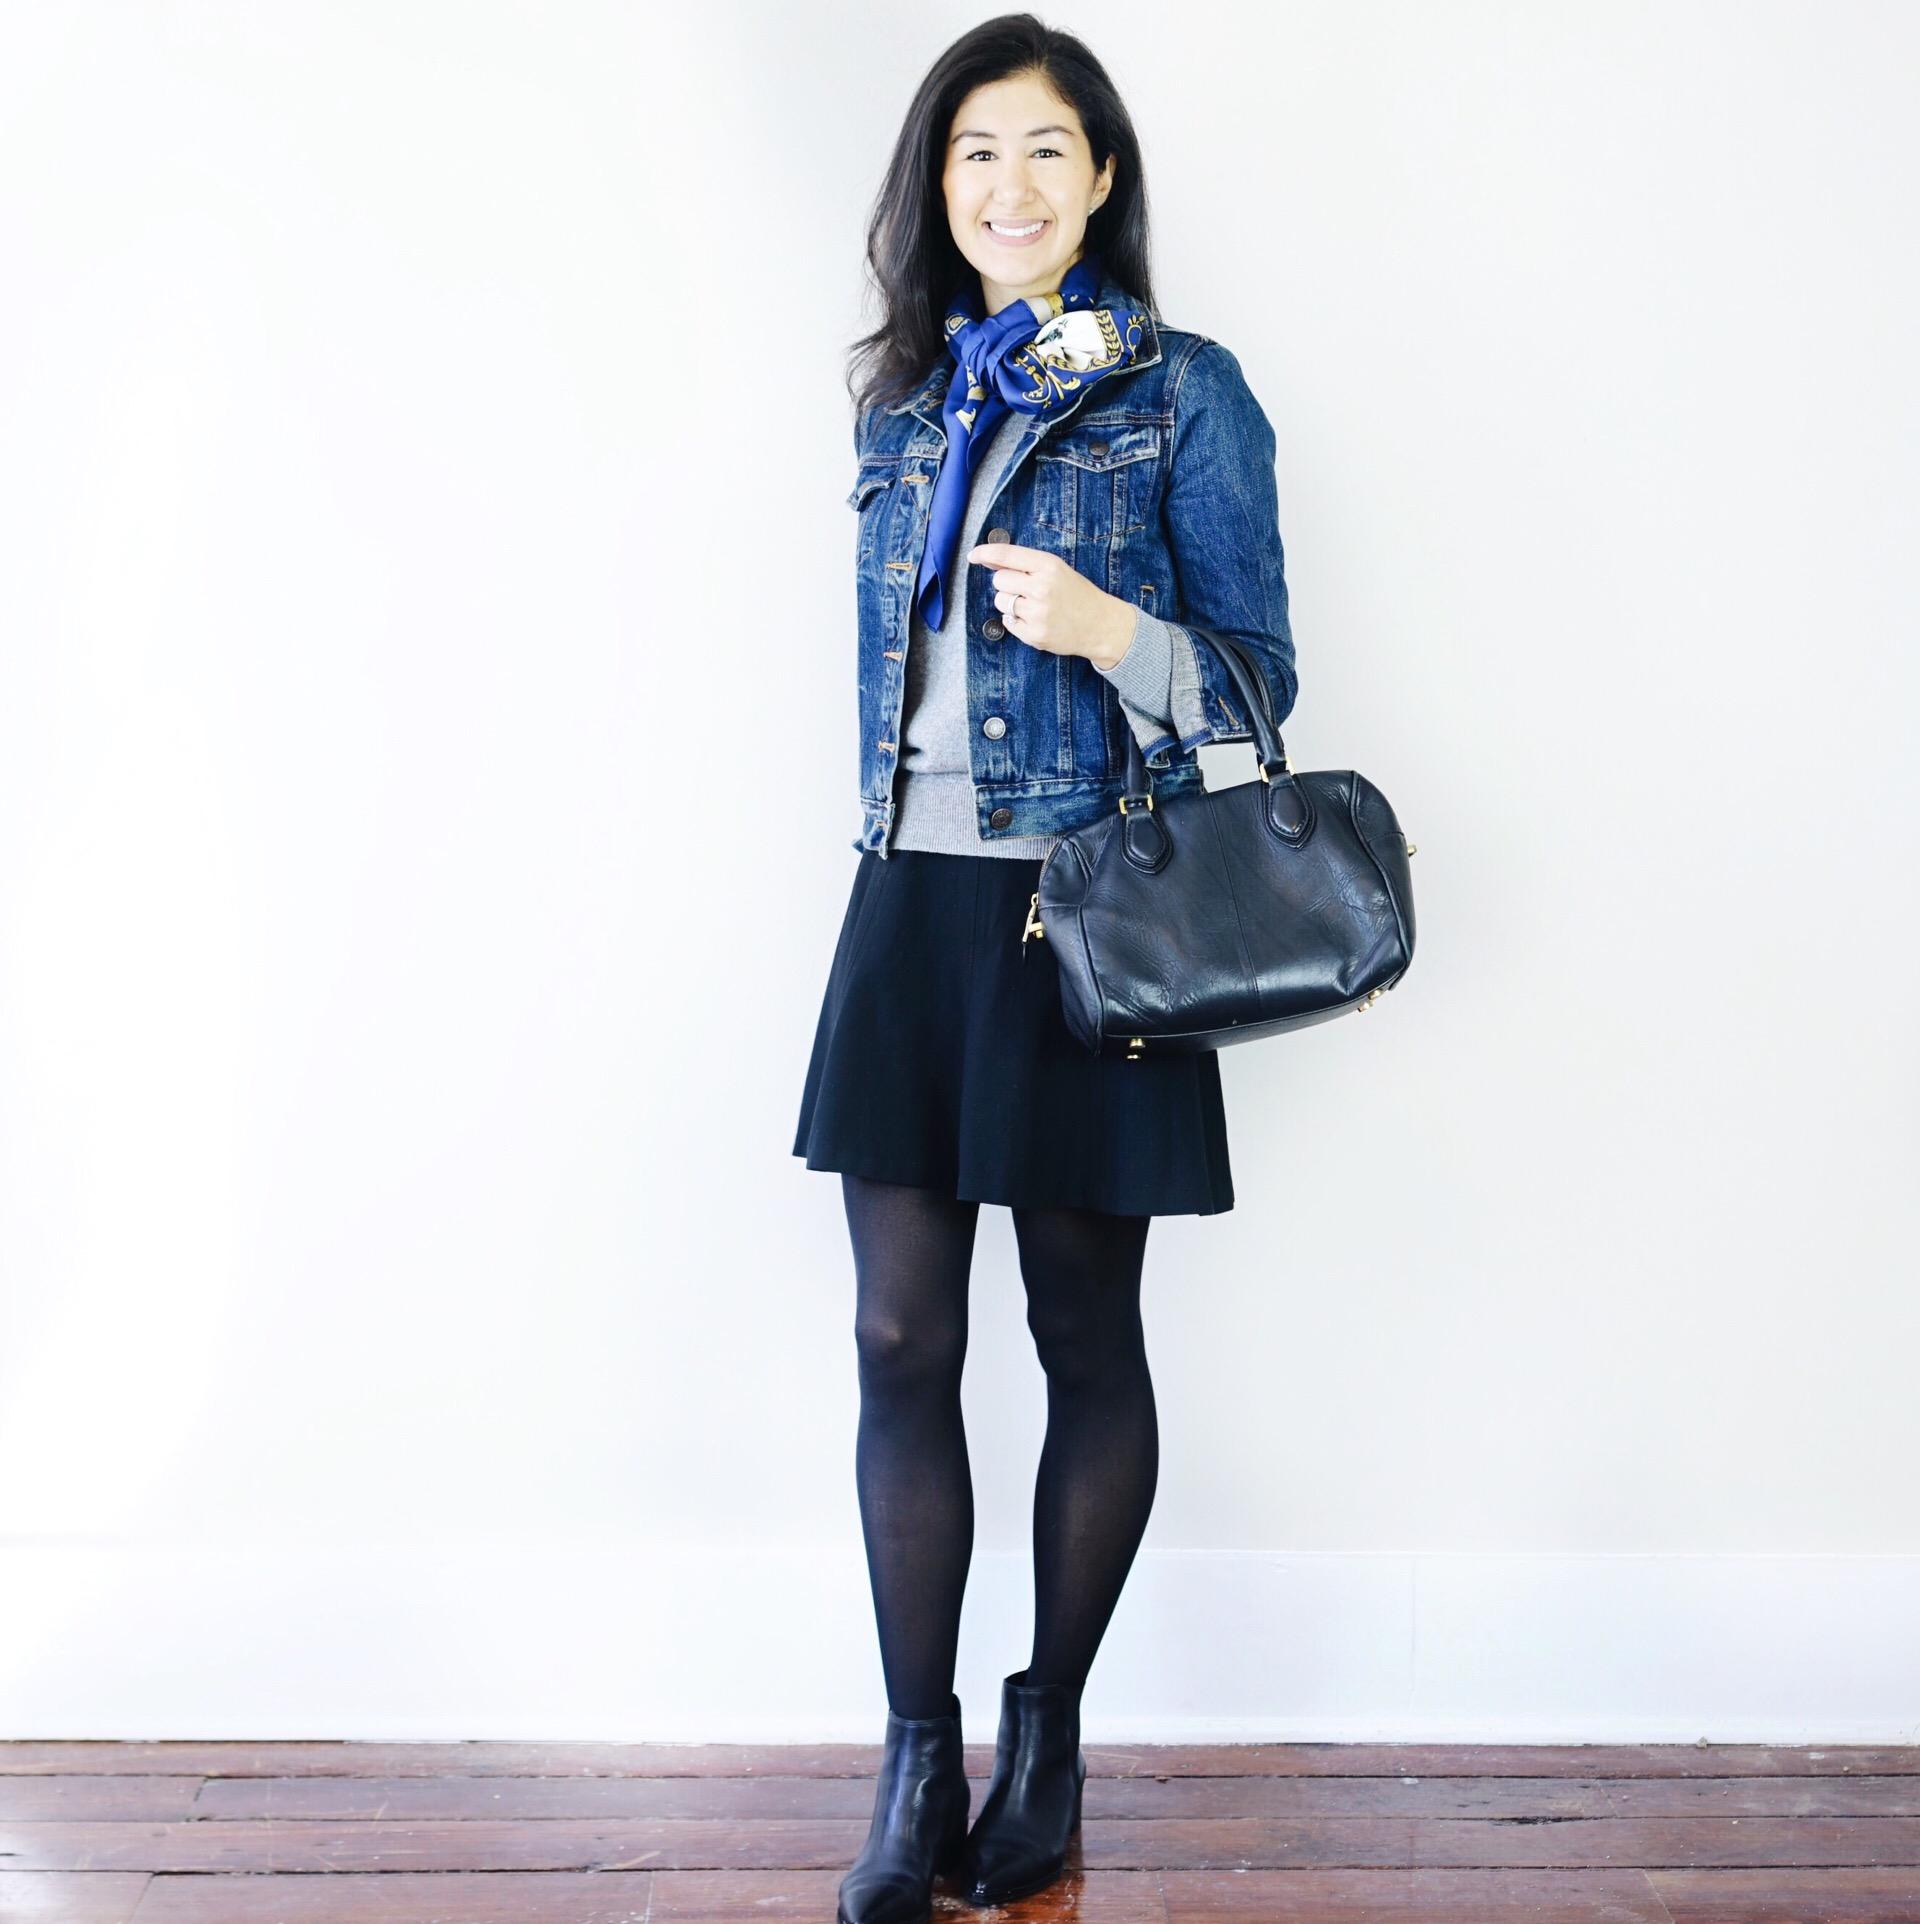 Jcrew-jean-jacket-hermes-silk-scarf-marc-fisher-yale-booties-everlane-cashmere-crew-LOFT-skirt-jcrew-purse.JPG